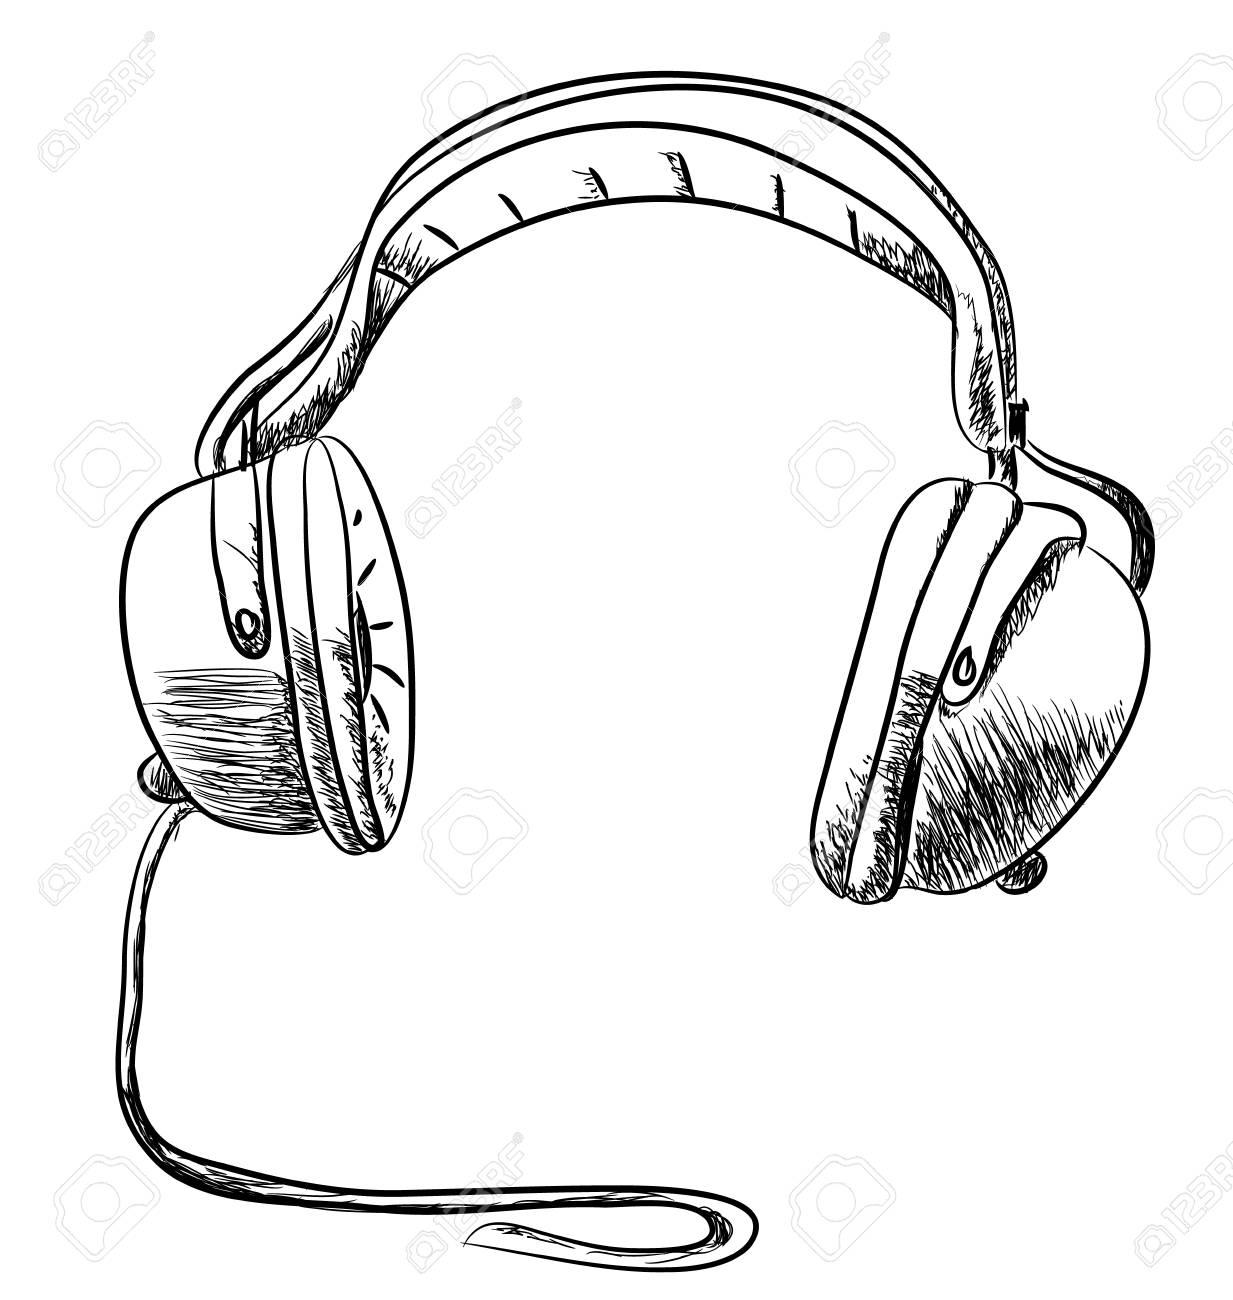 Dessin Casque Audio main casque dessiné dessin vectoriel clip art libres de droits